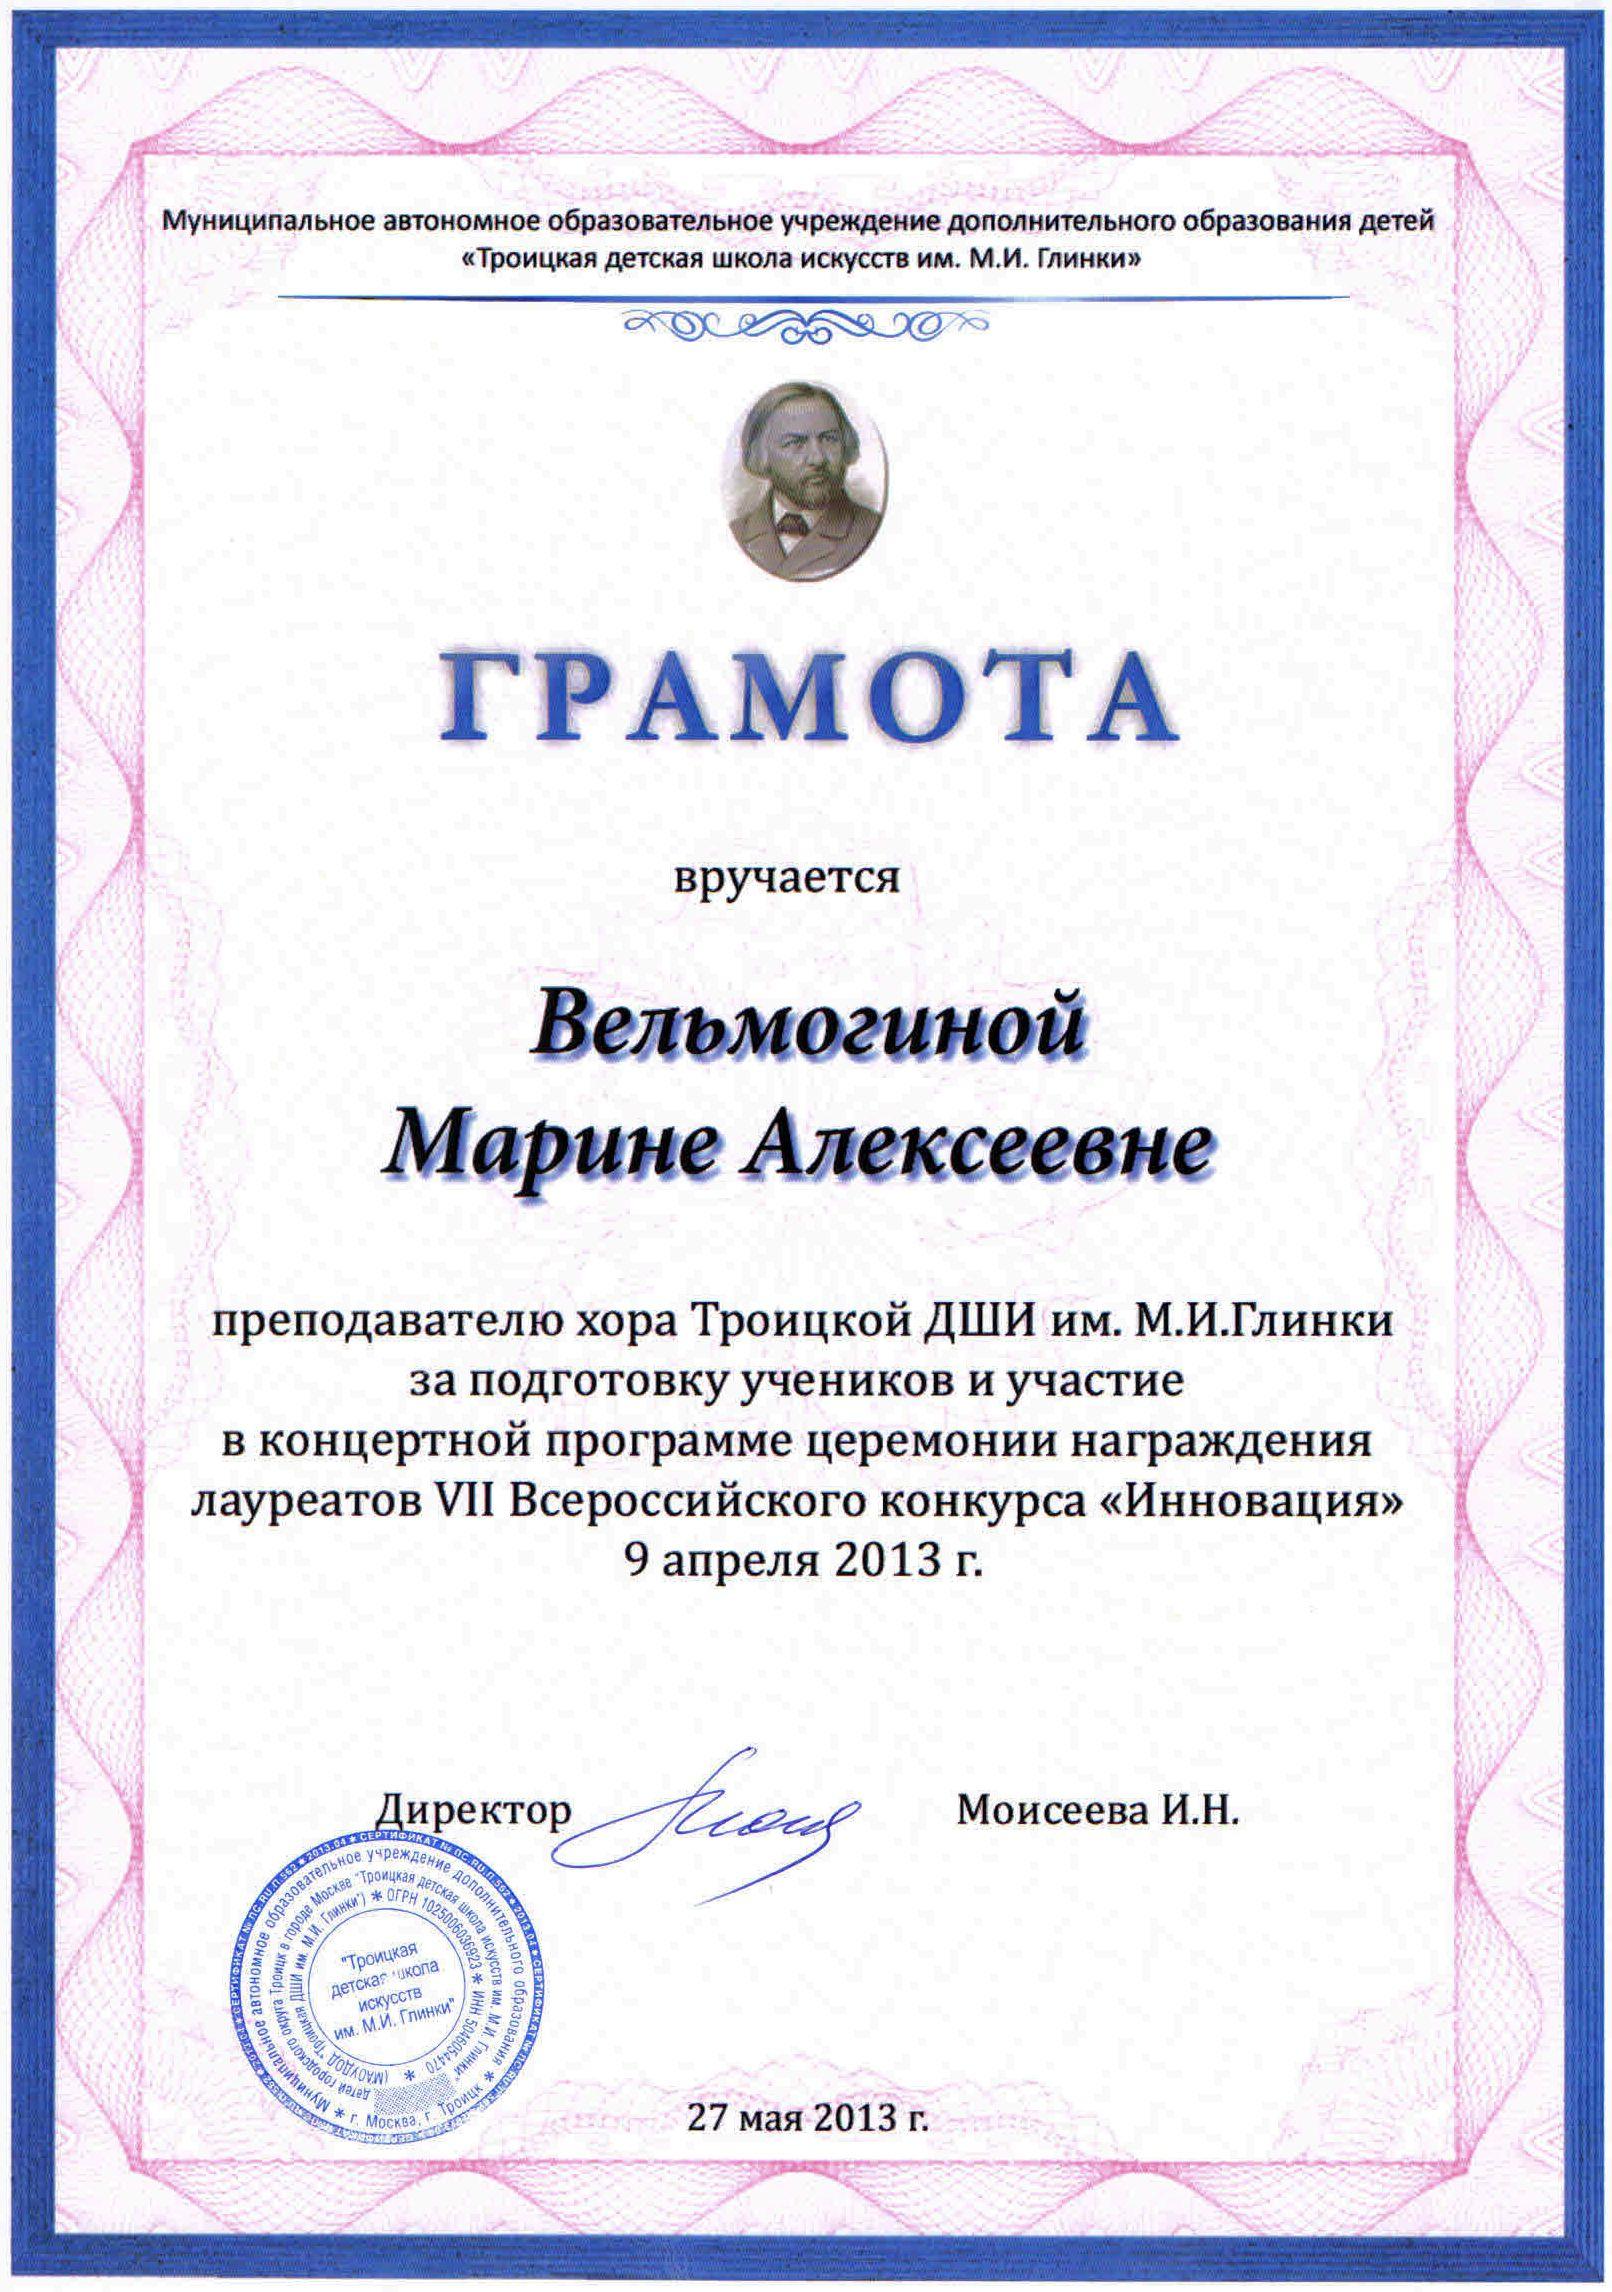 Gramota_Innovaciya2013